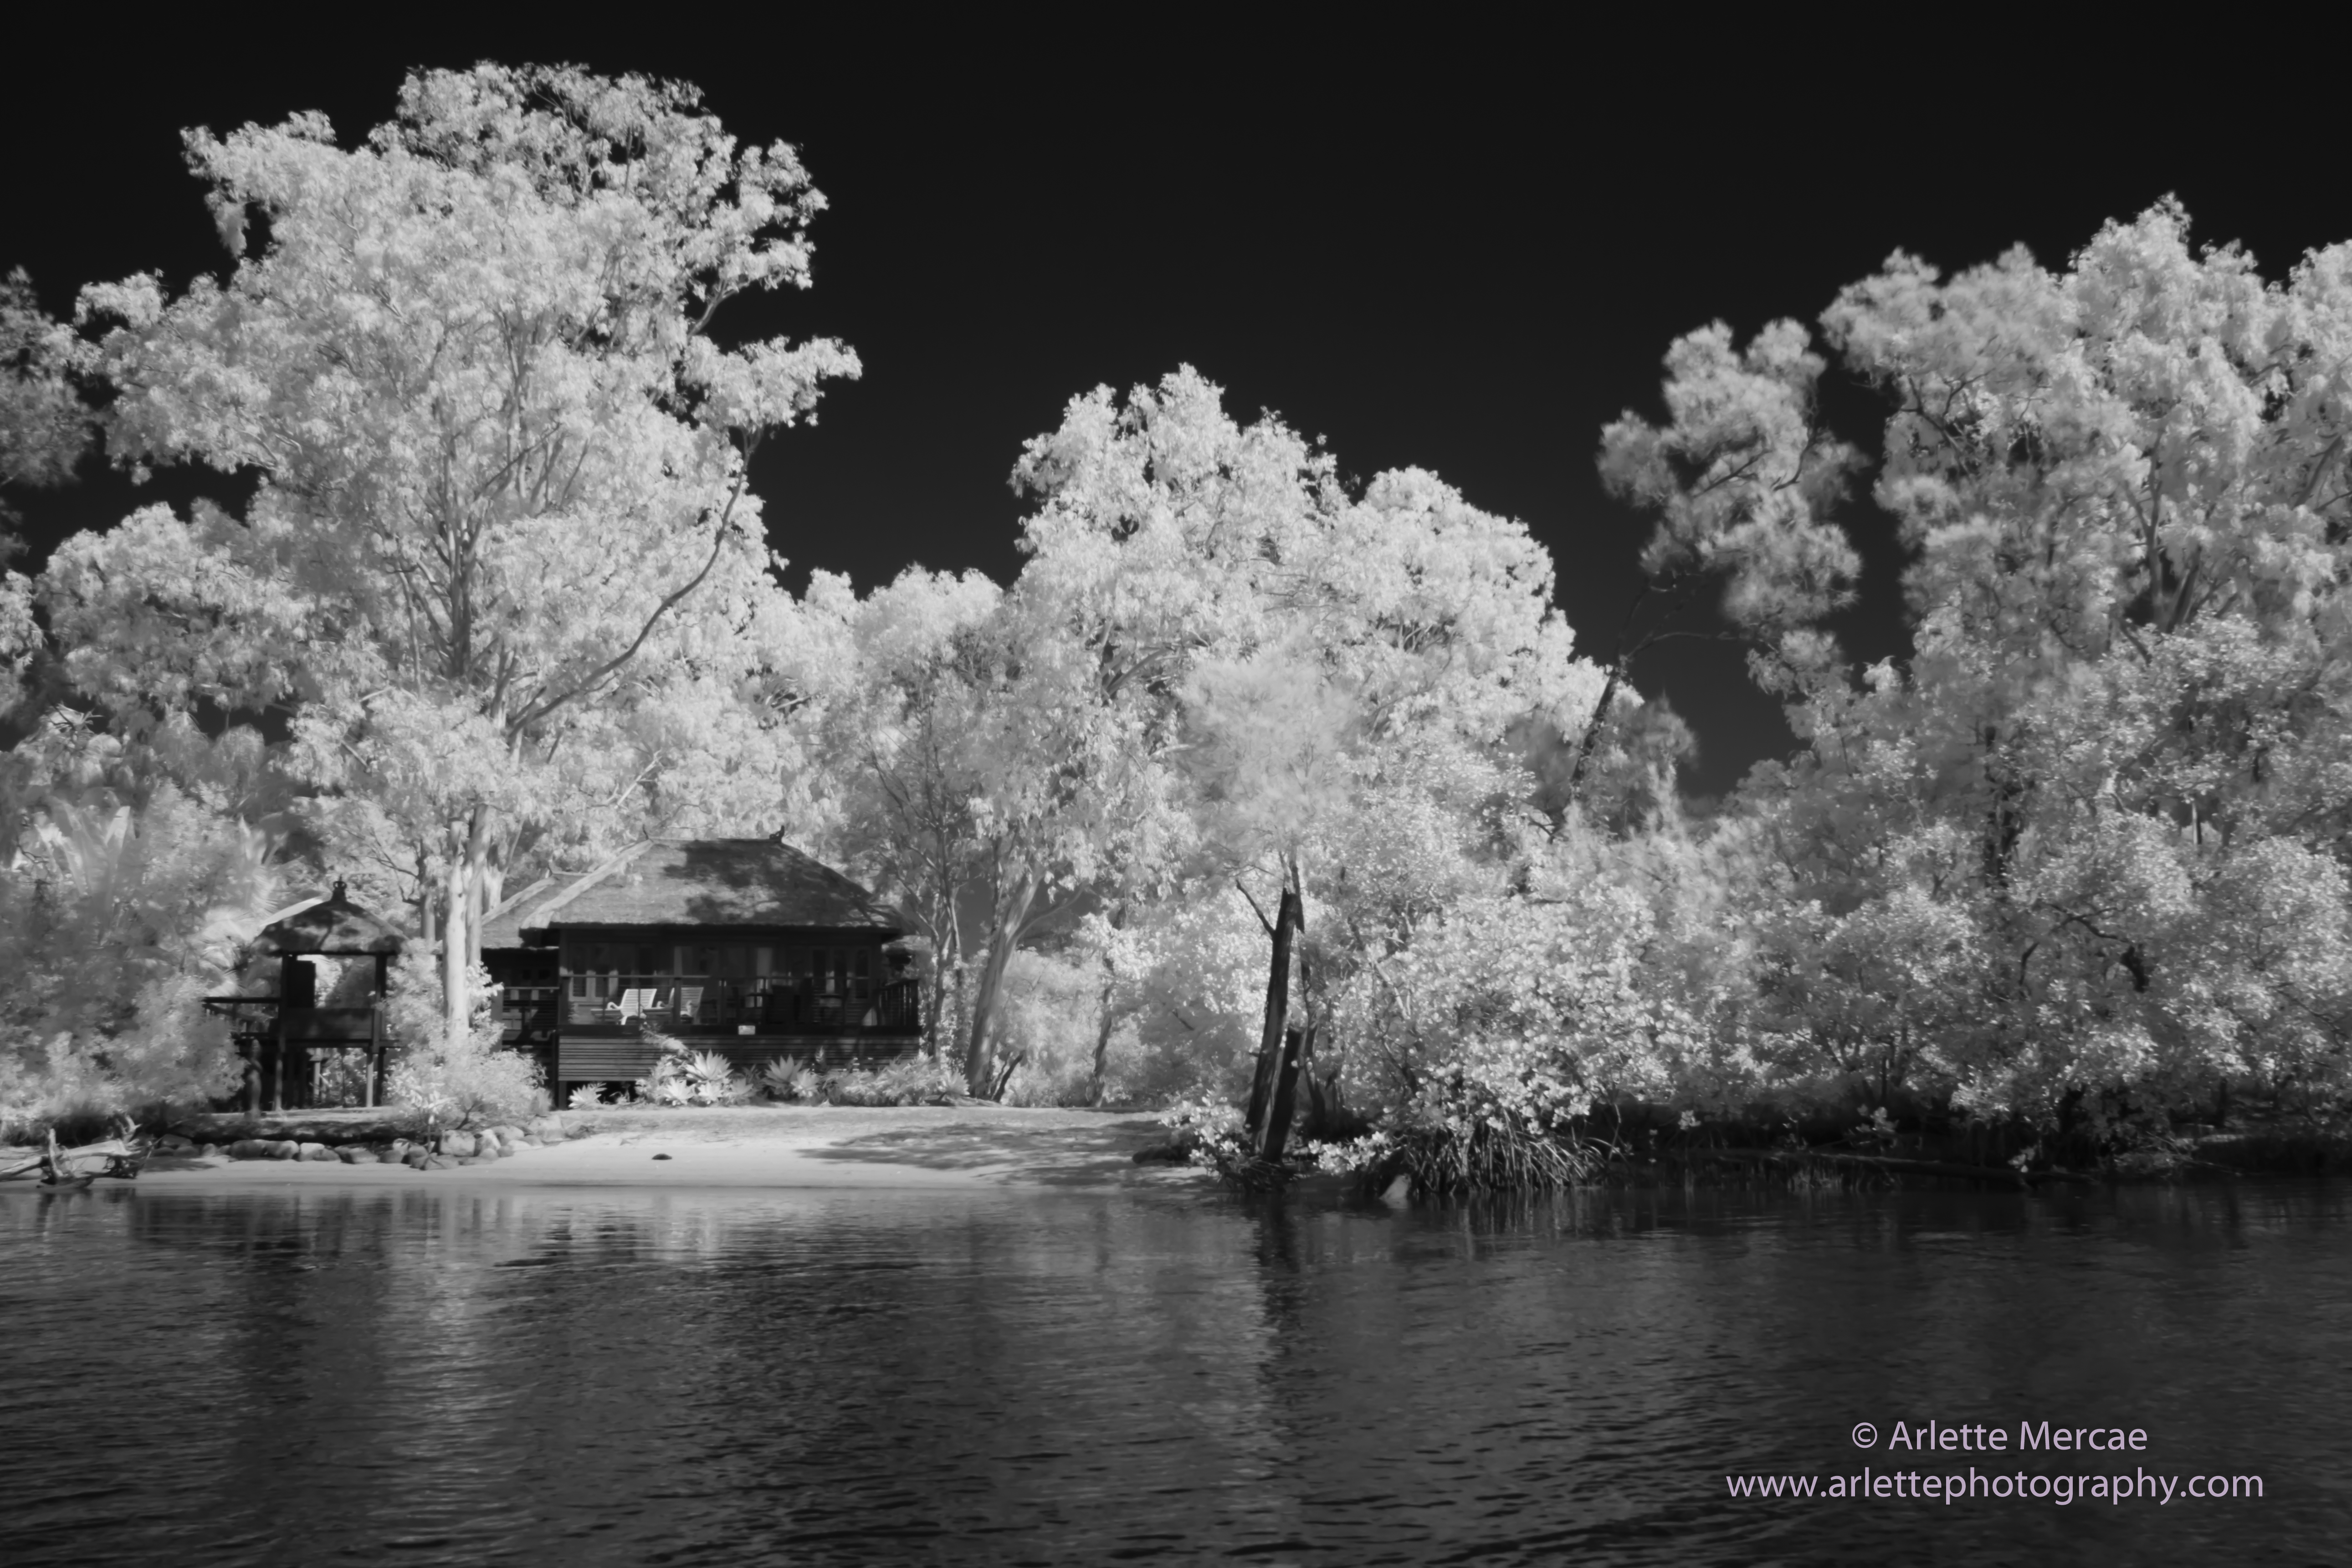 Noosa Everglades - 2